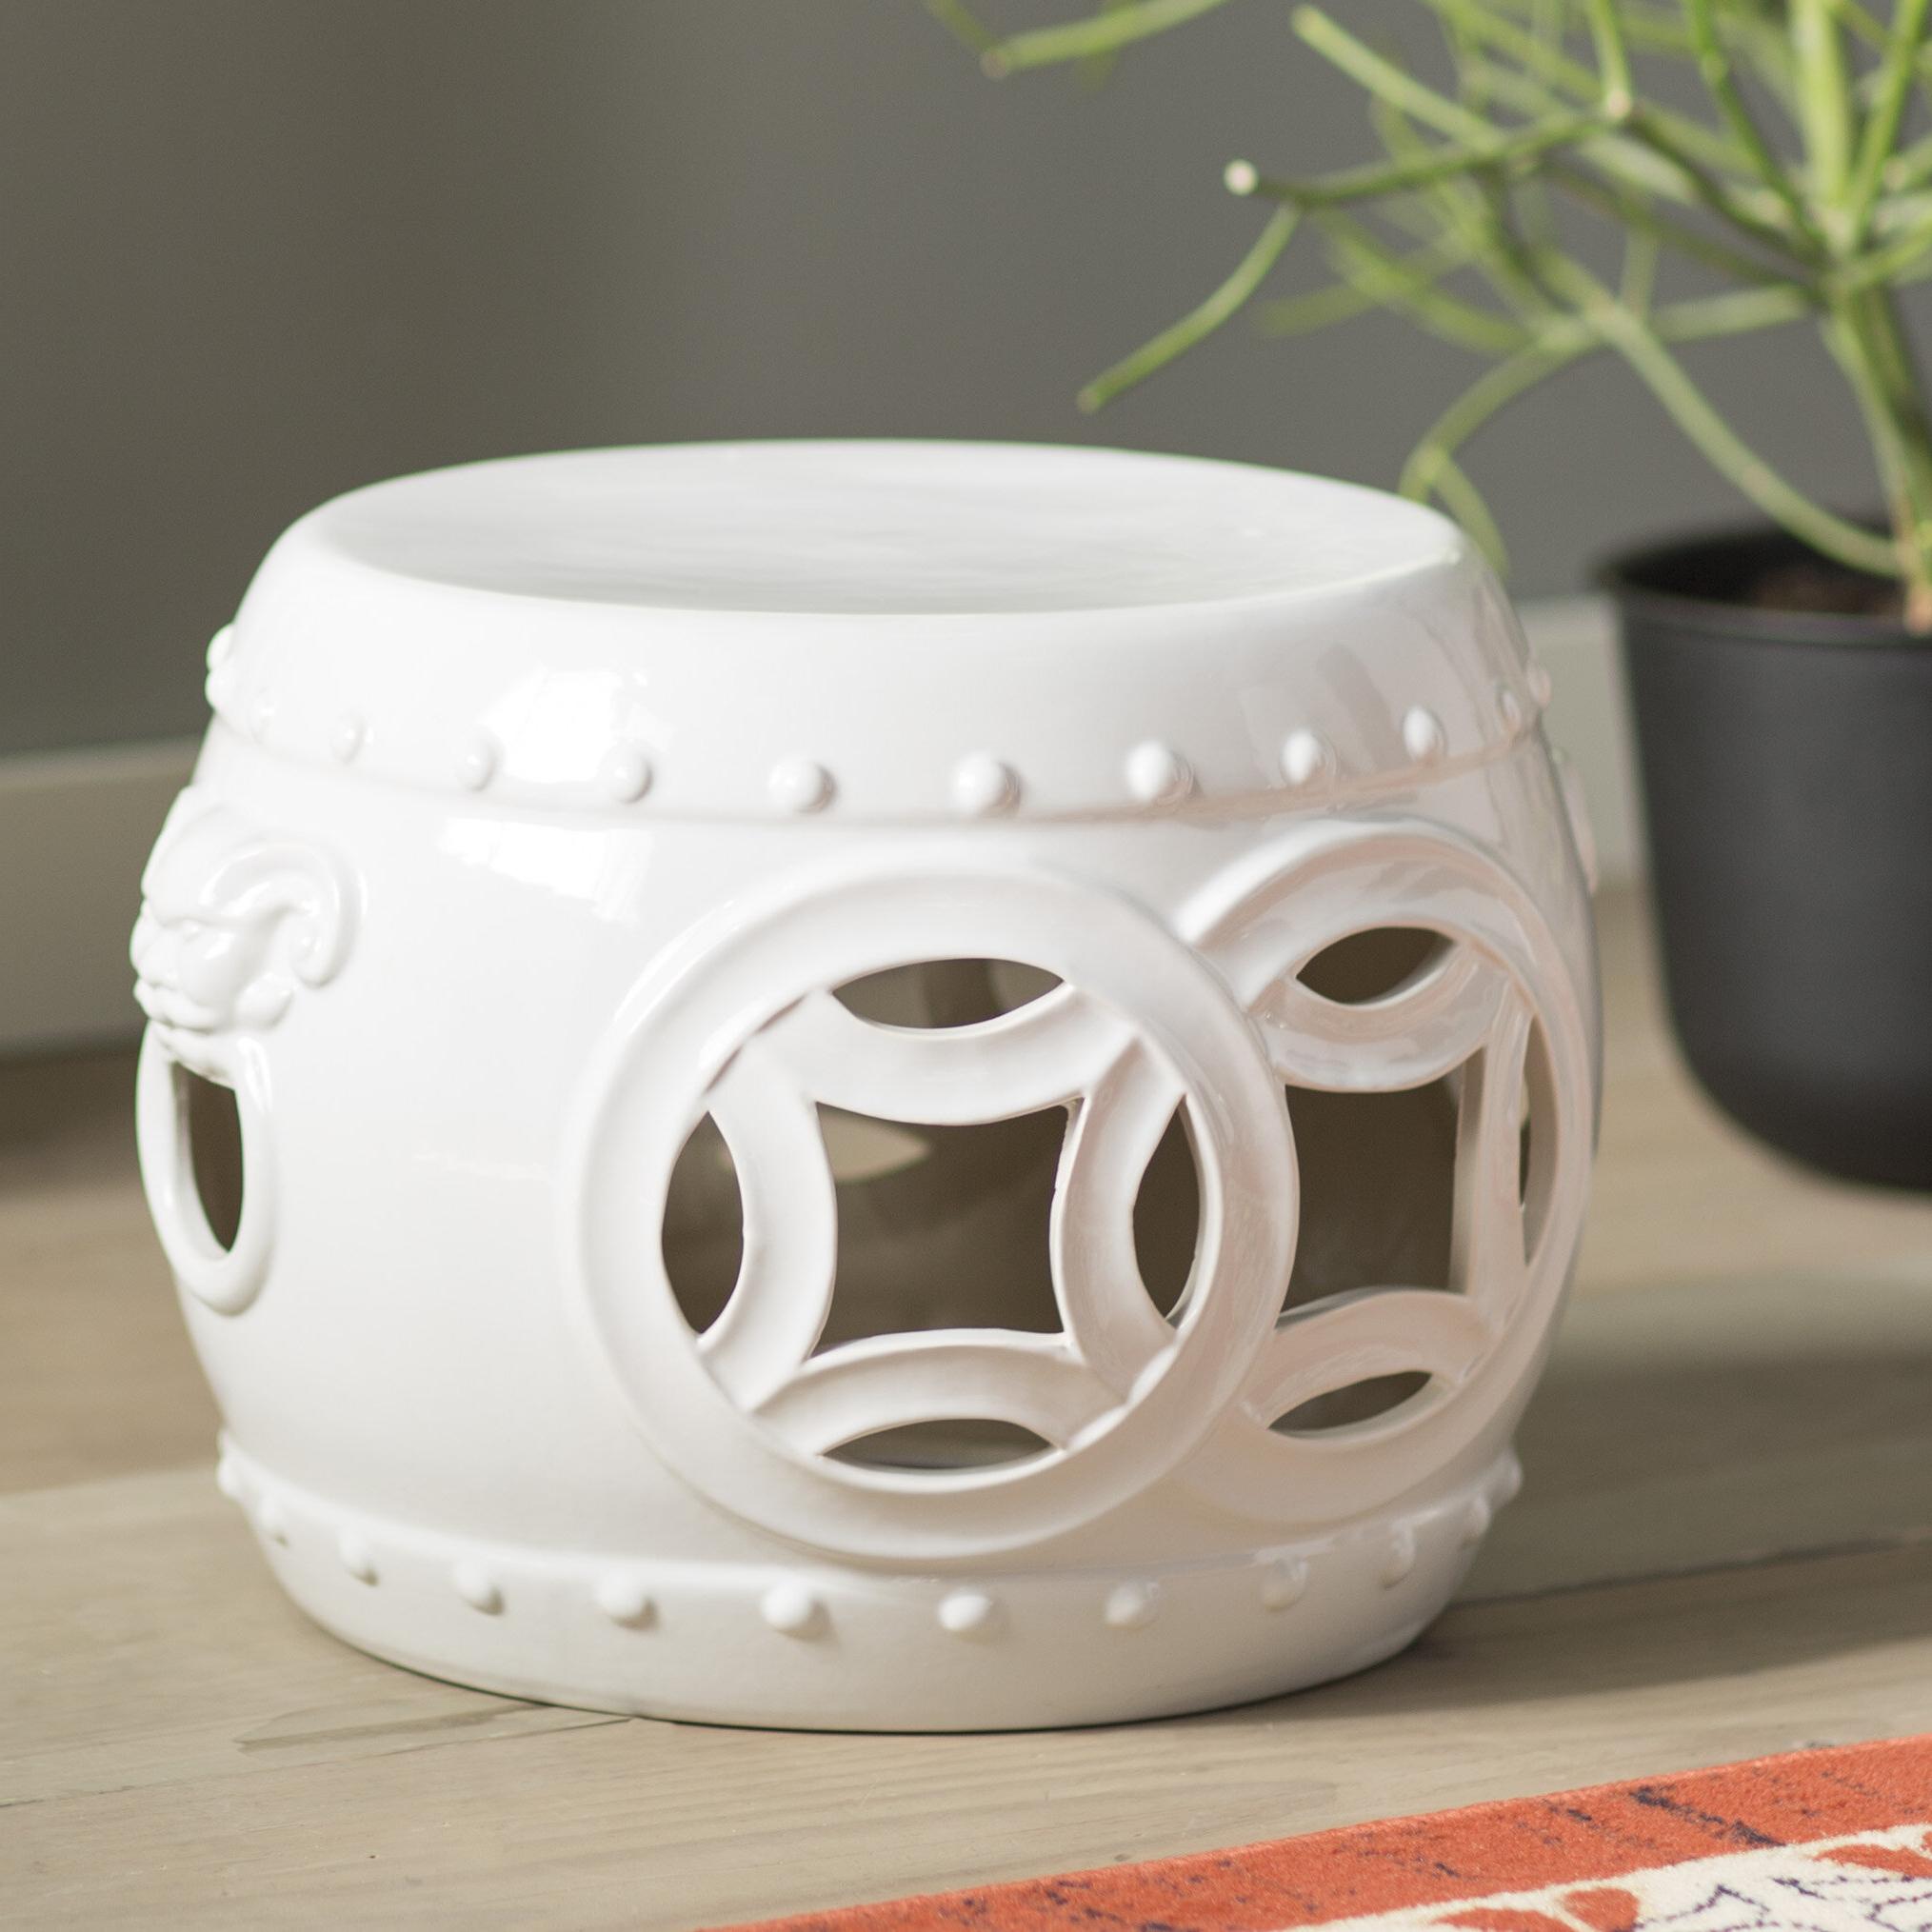 Canarsie Ceramic Garden Stools In Best And Newest Veer Garden Stool (View 27 of 30)